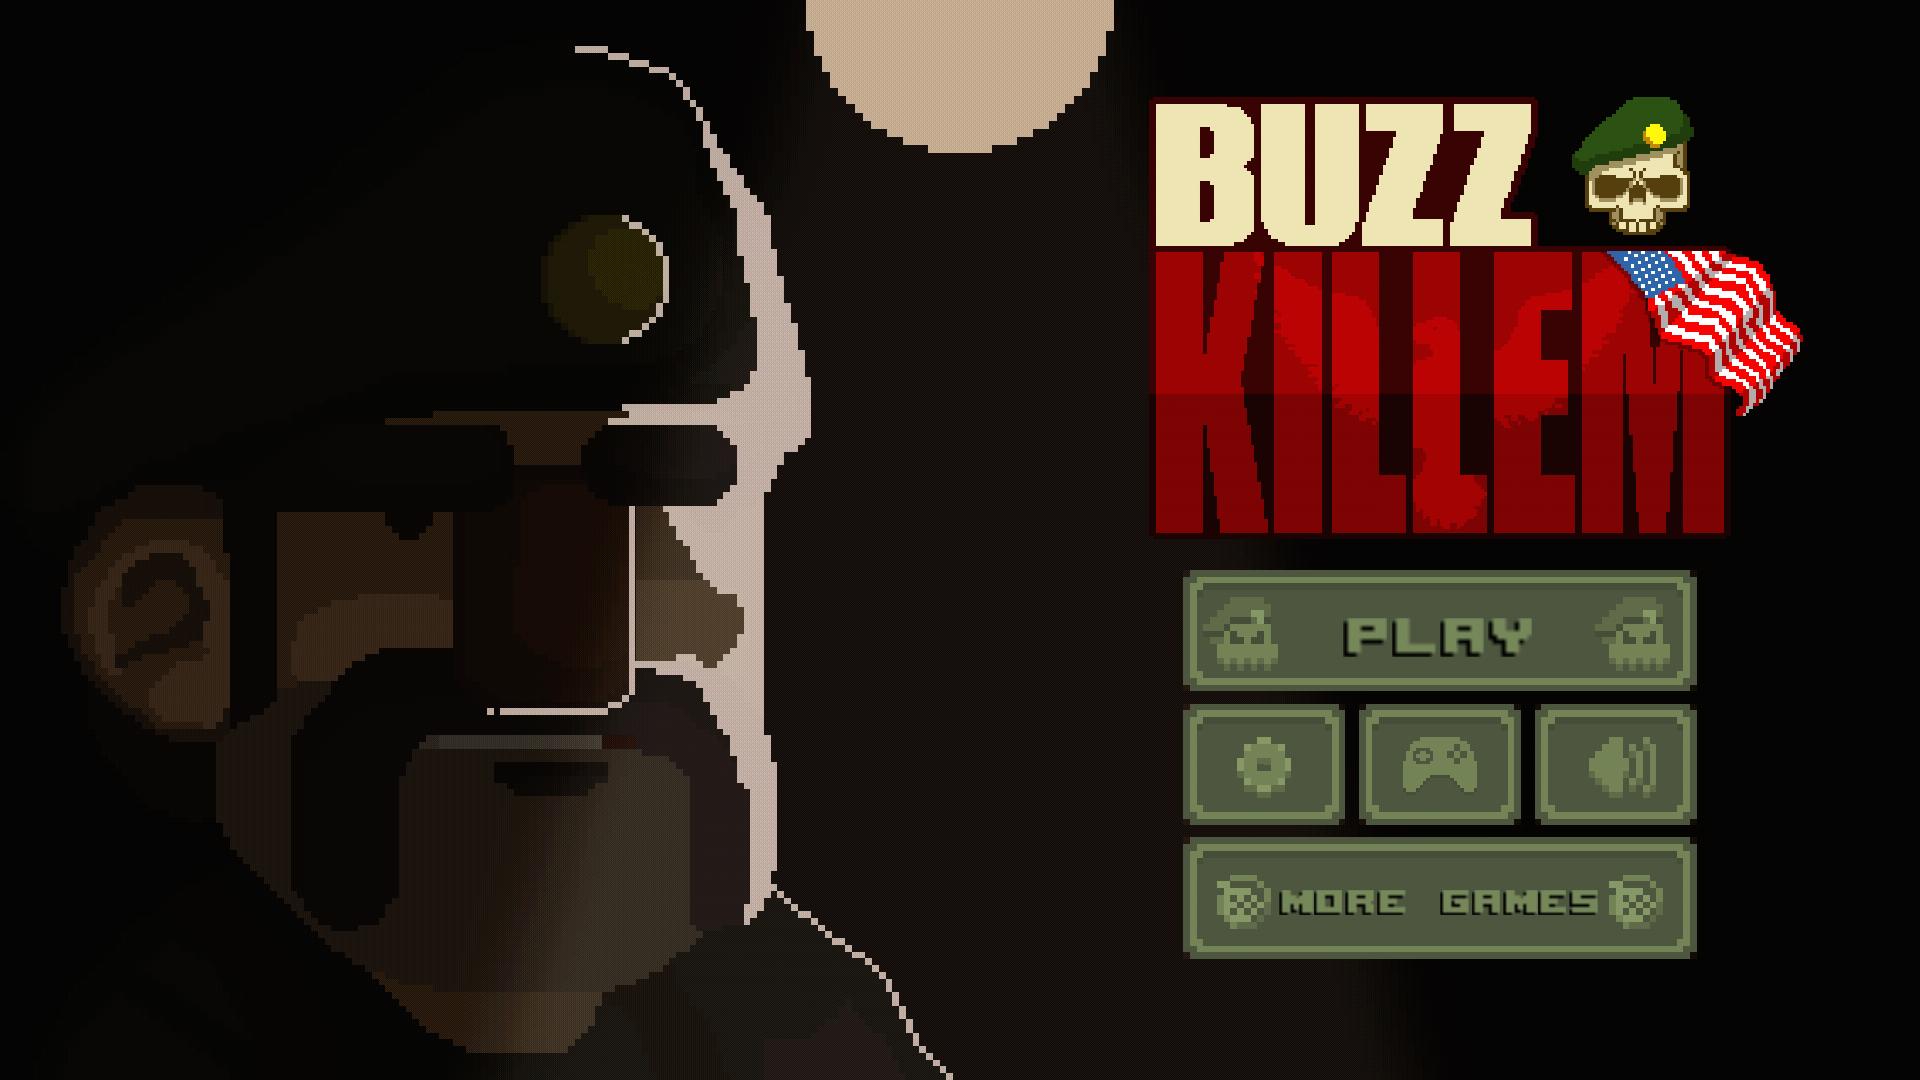 Buzz Killem screenshot #21